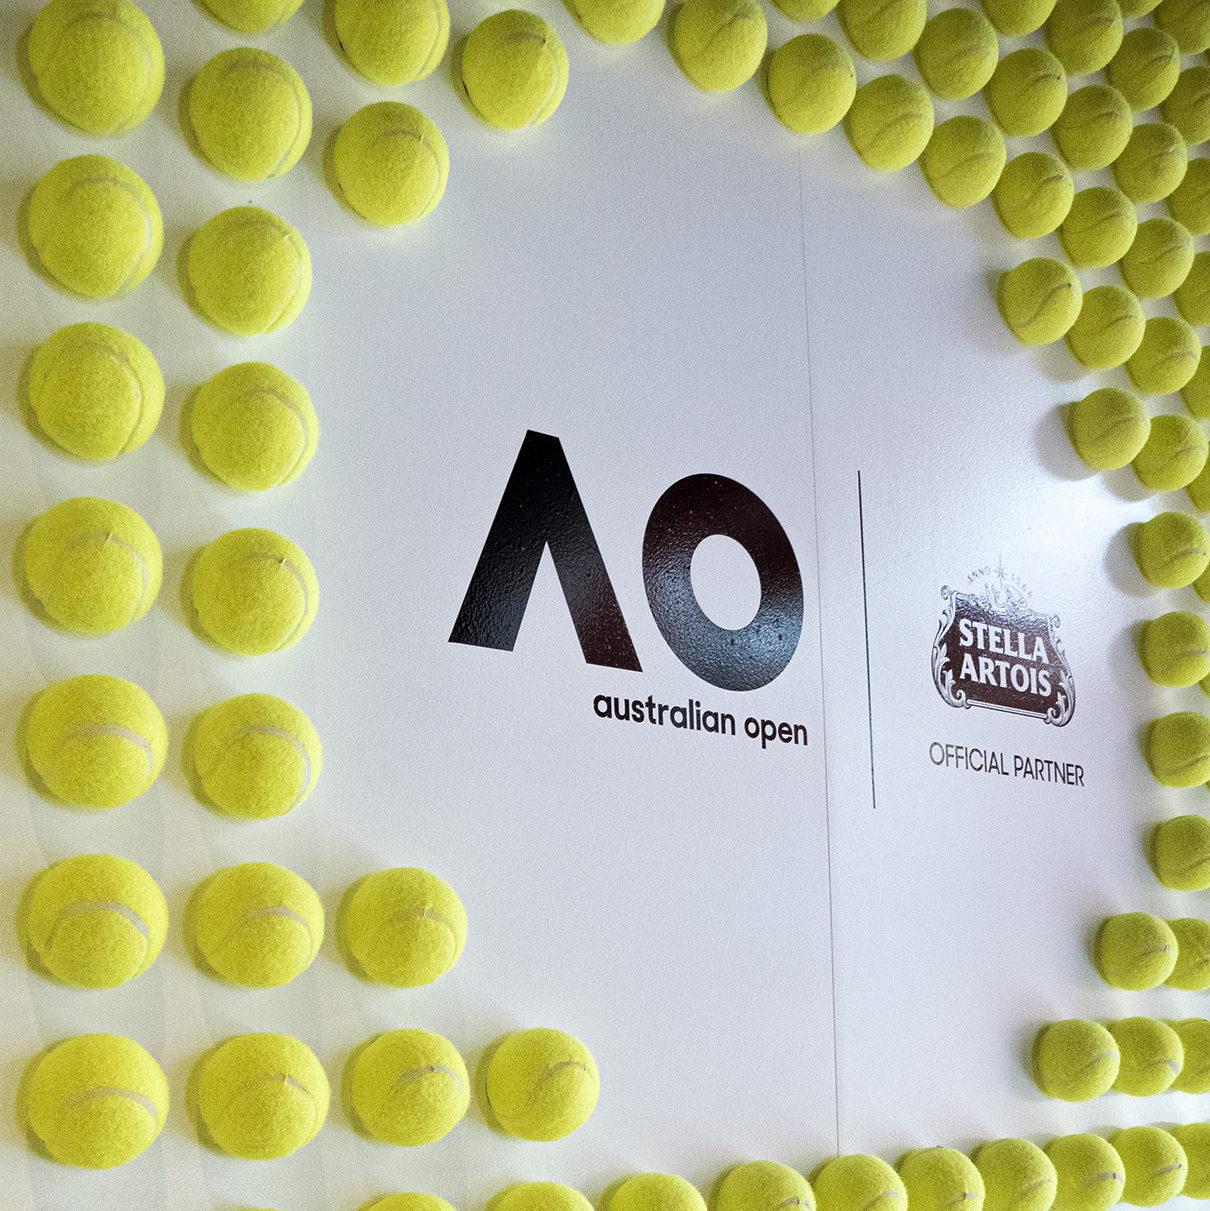 Stella Artois AO Tennis Ball Media Wall Pub Crown